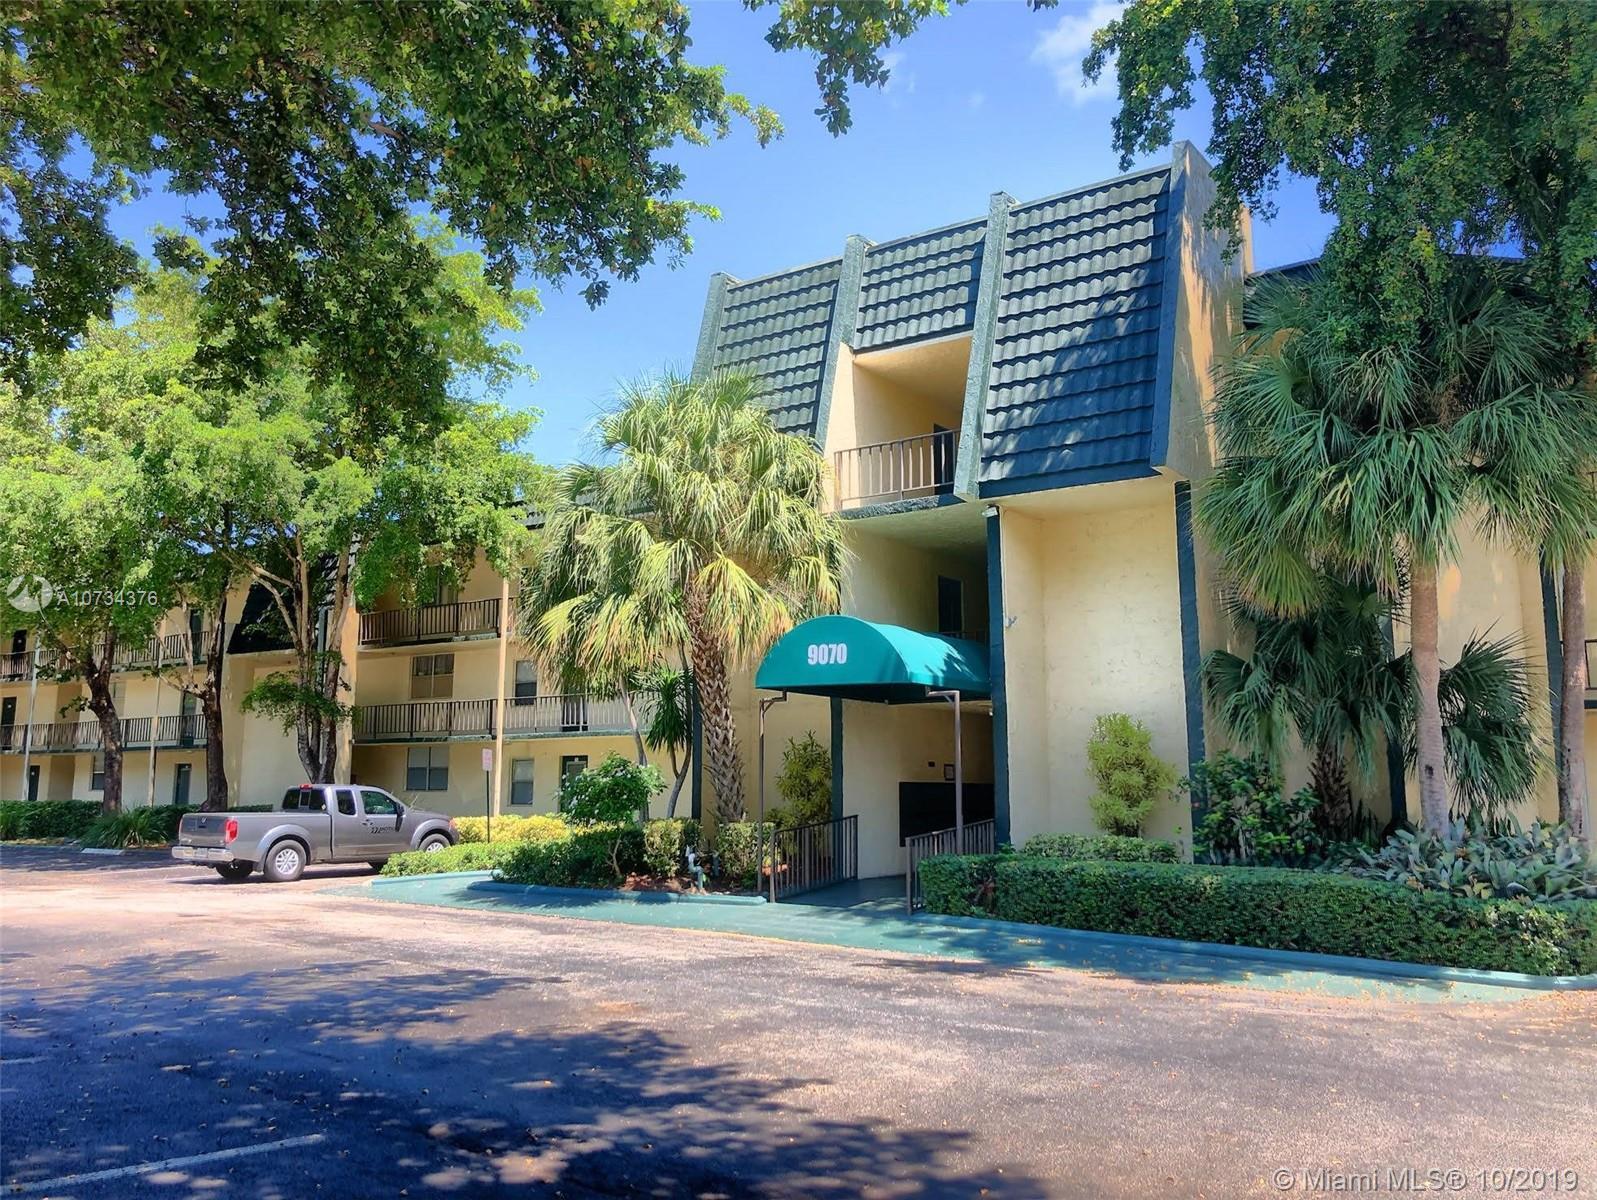 Property for sale at 9070 Lime Bay Blvd # 203, Tamarac FL 33321 Unit 203, Tamarac,  Florida 33321